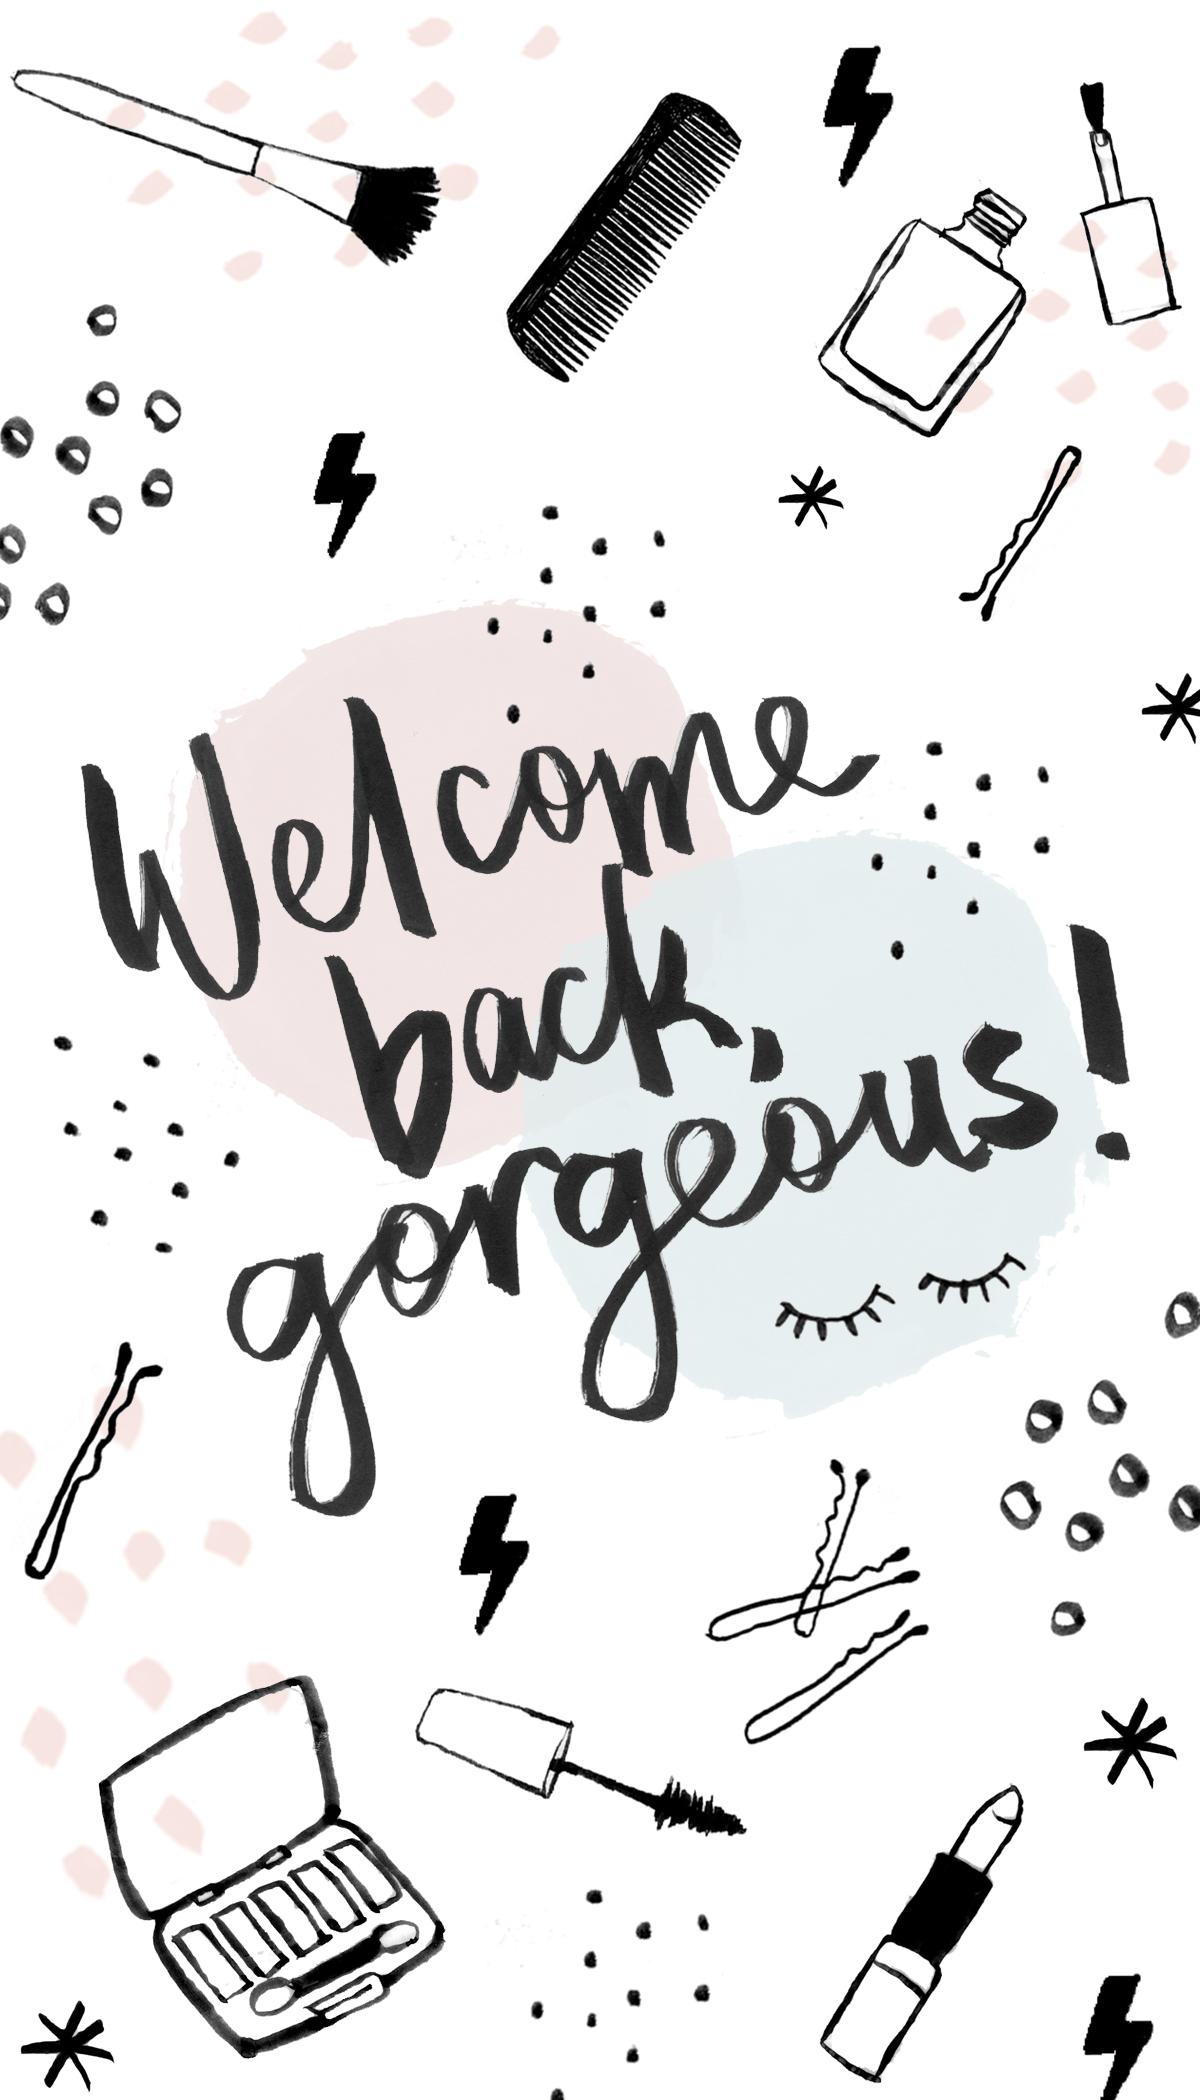 welcomebackgorgeous-August12.jpg